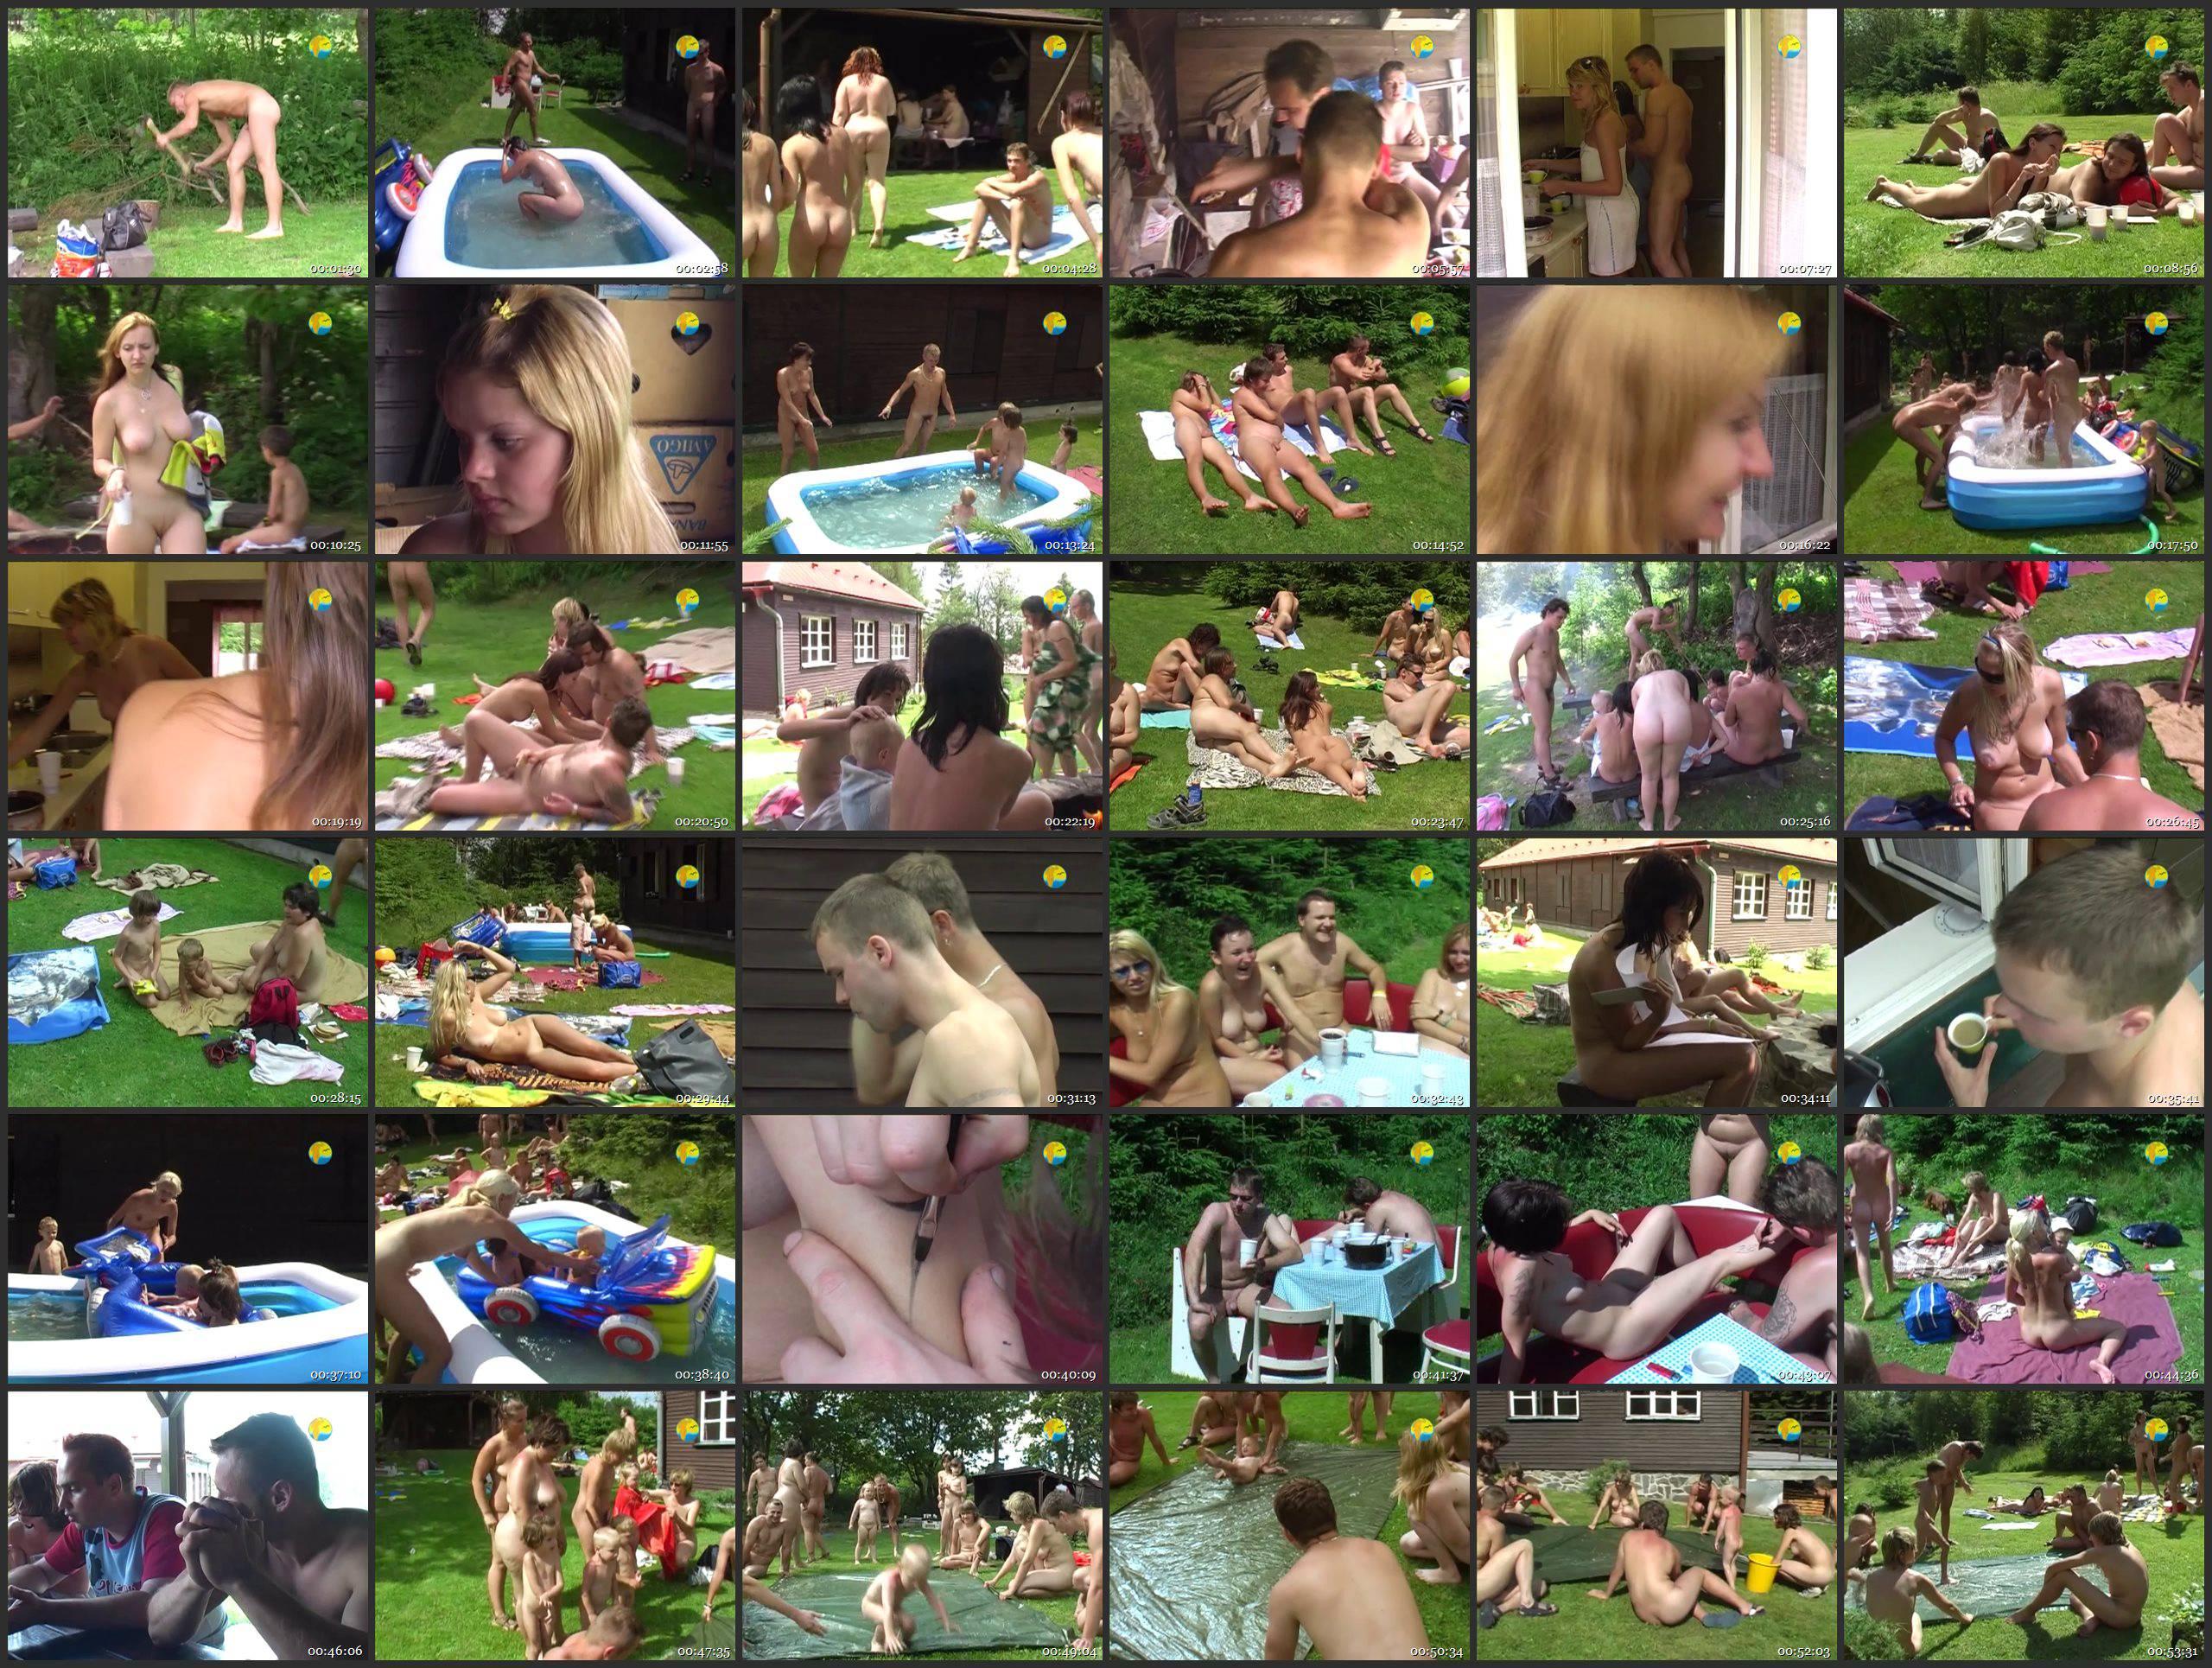 Naturist Freedom Videos-Cottage Picnic - Thumbnails